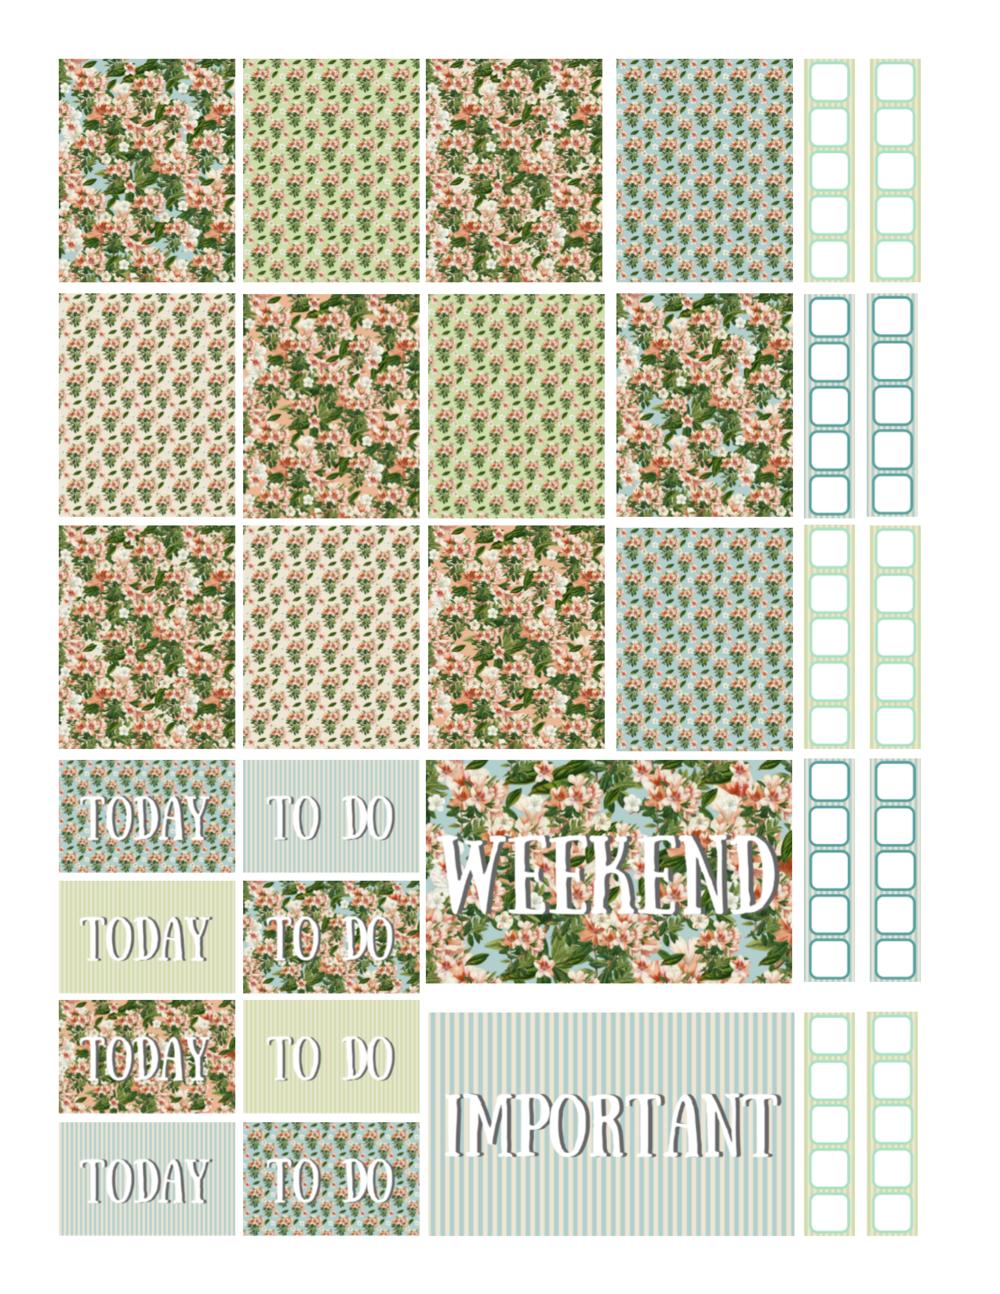 free printable vintage azalea flowers planner stickers.png